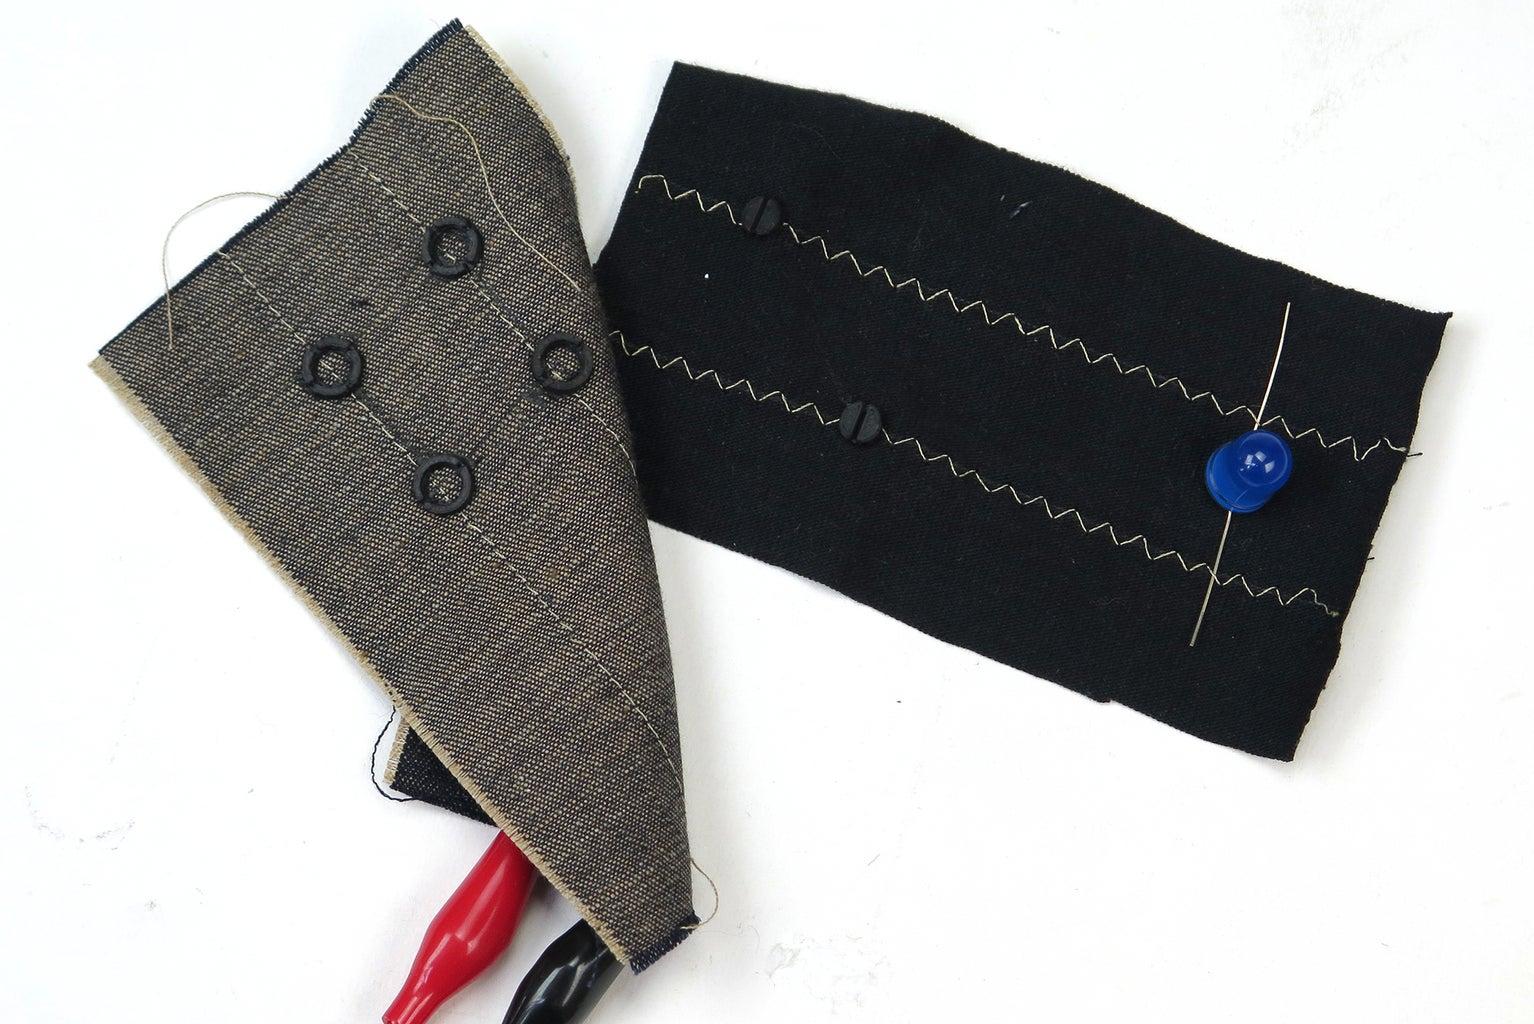 3D Printed Conductive Snap Fabric